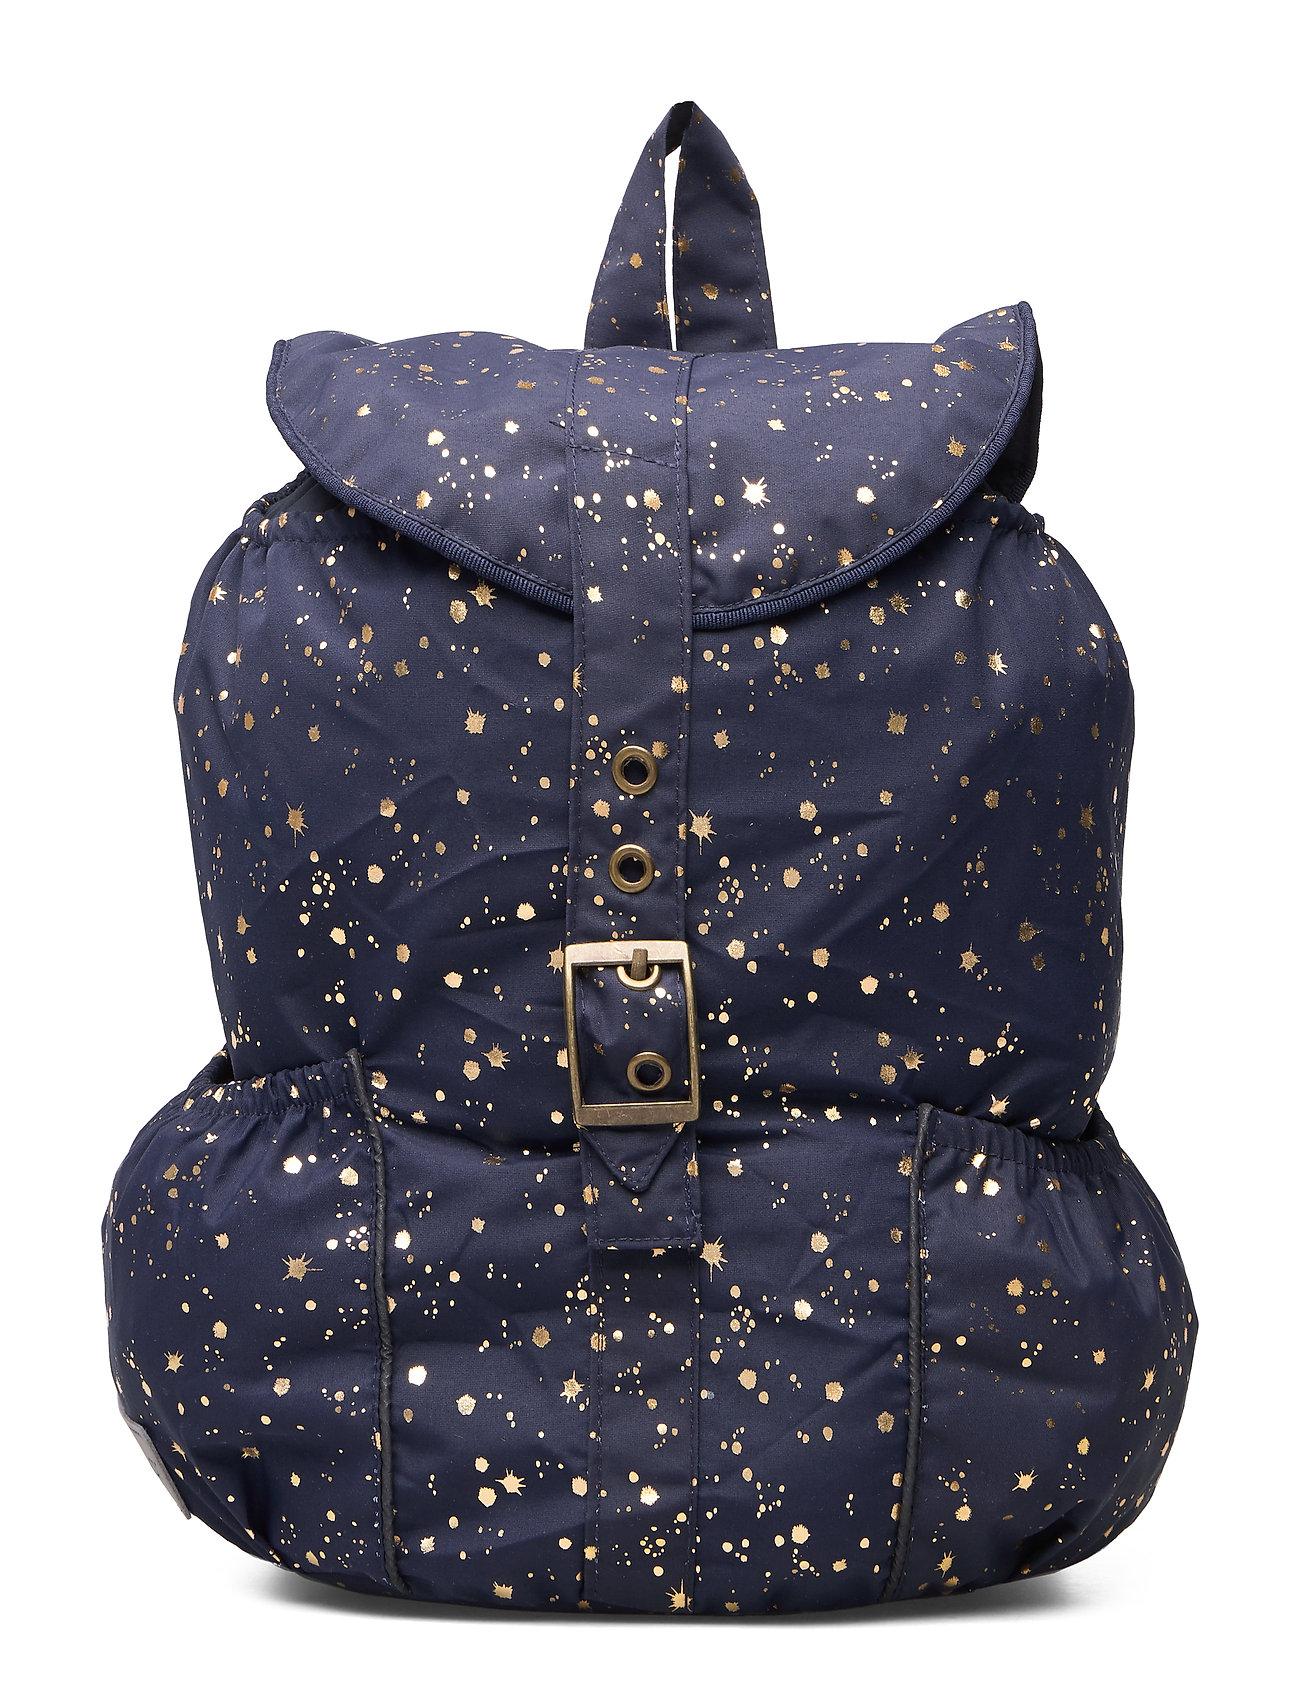 MarMar Cph Backpack - DARKEST BLUE